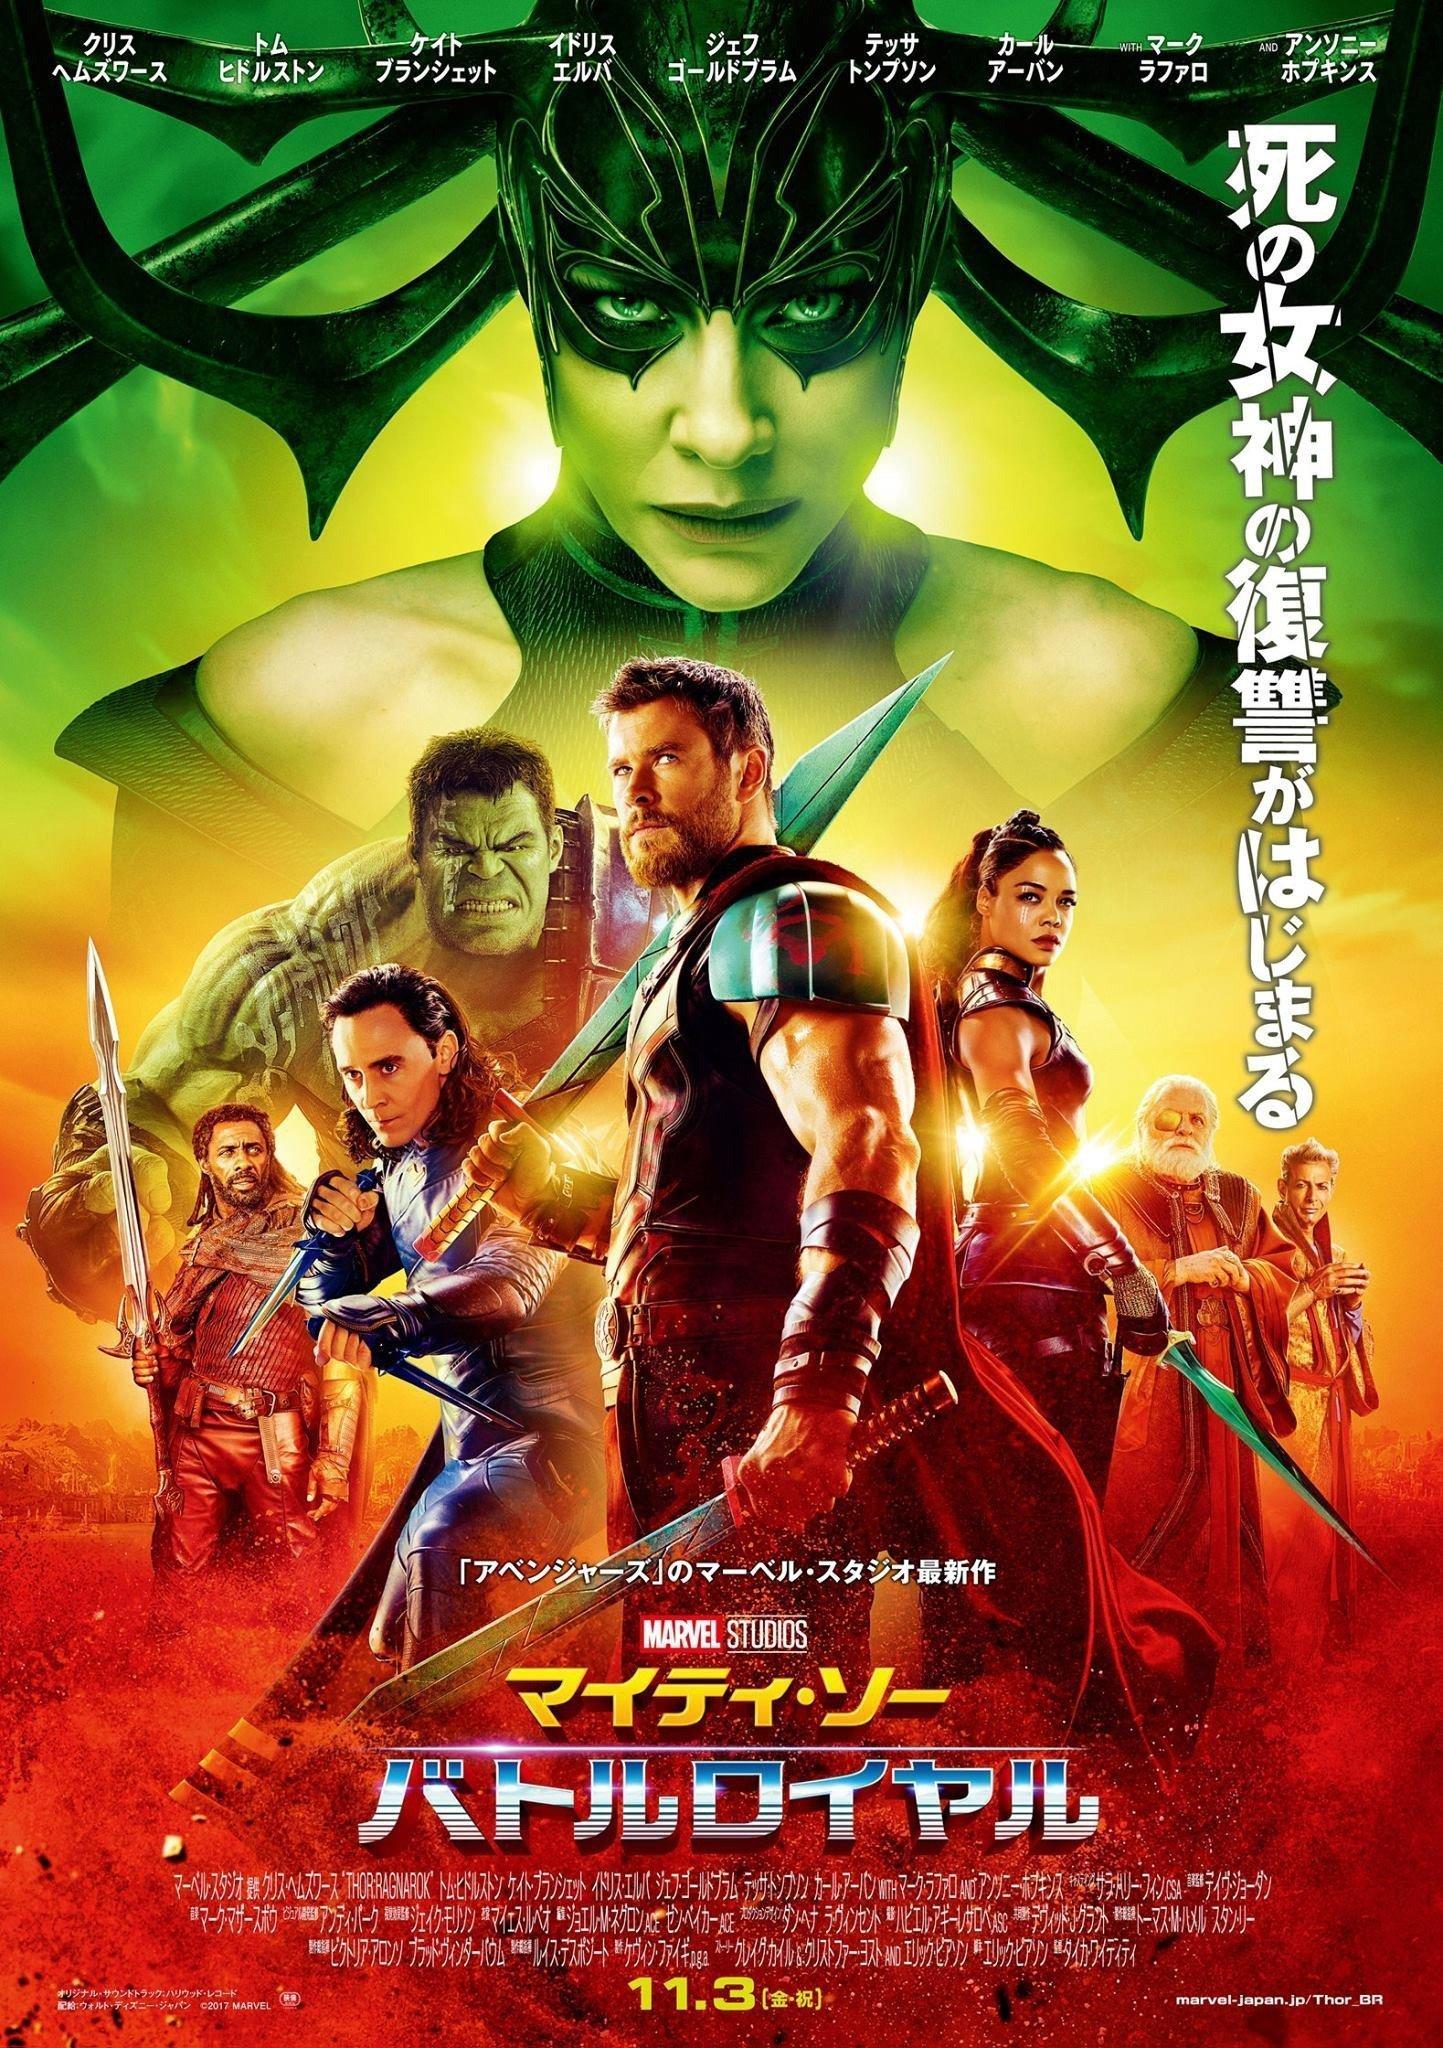 Poster japonais du film Thor: Ragnarok